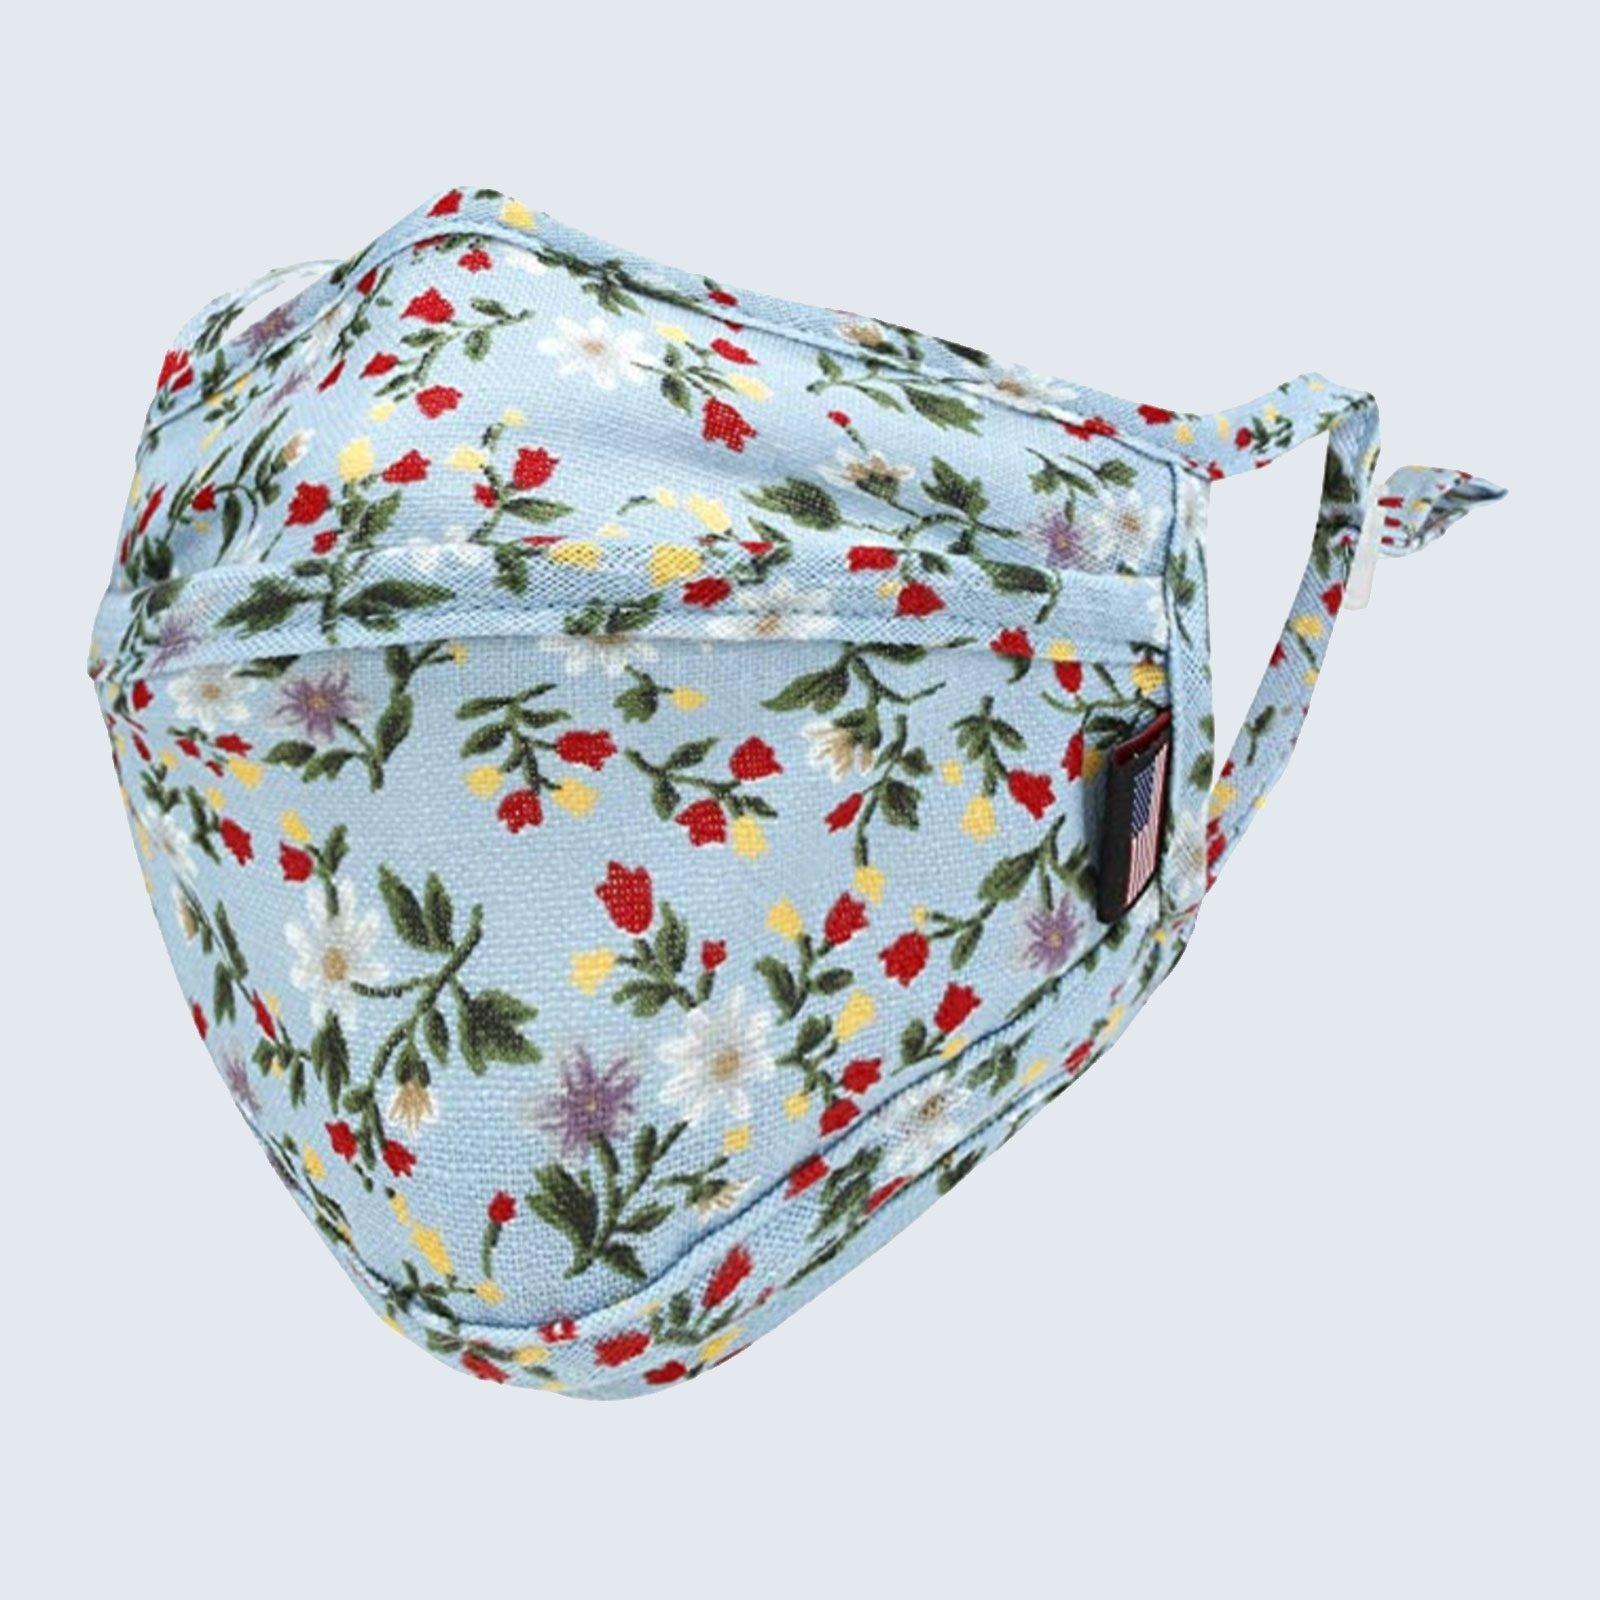 ililily Cotton Floral Patterned Face Cover